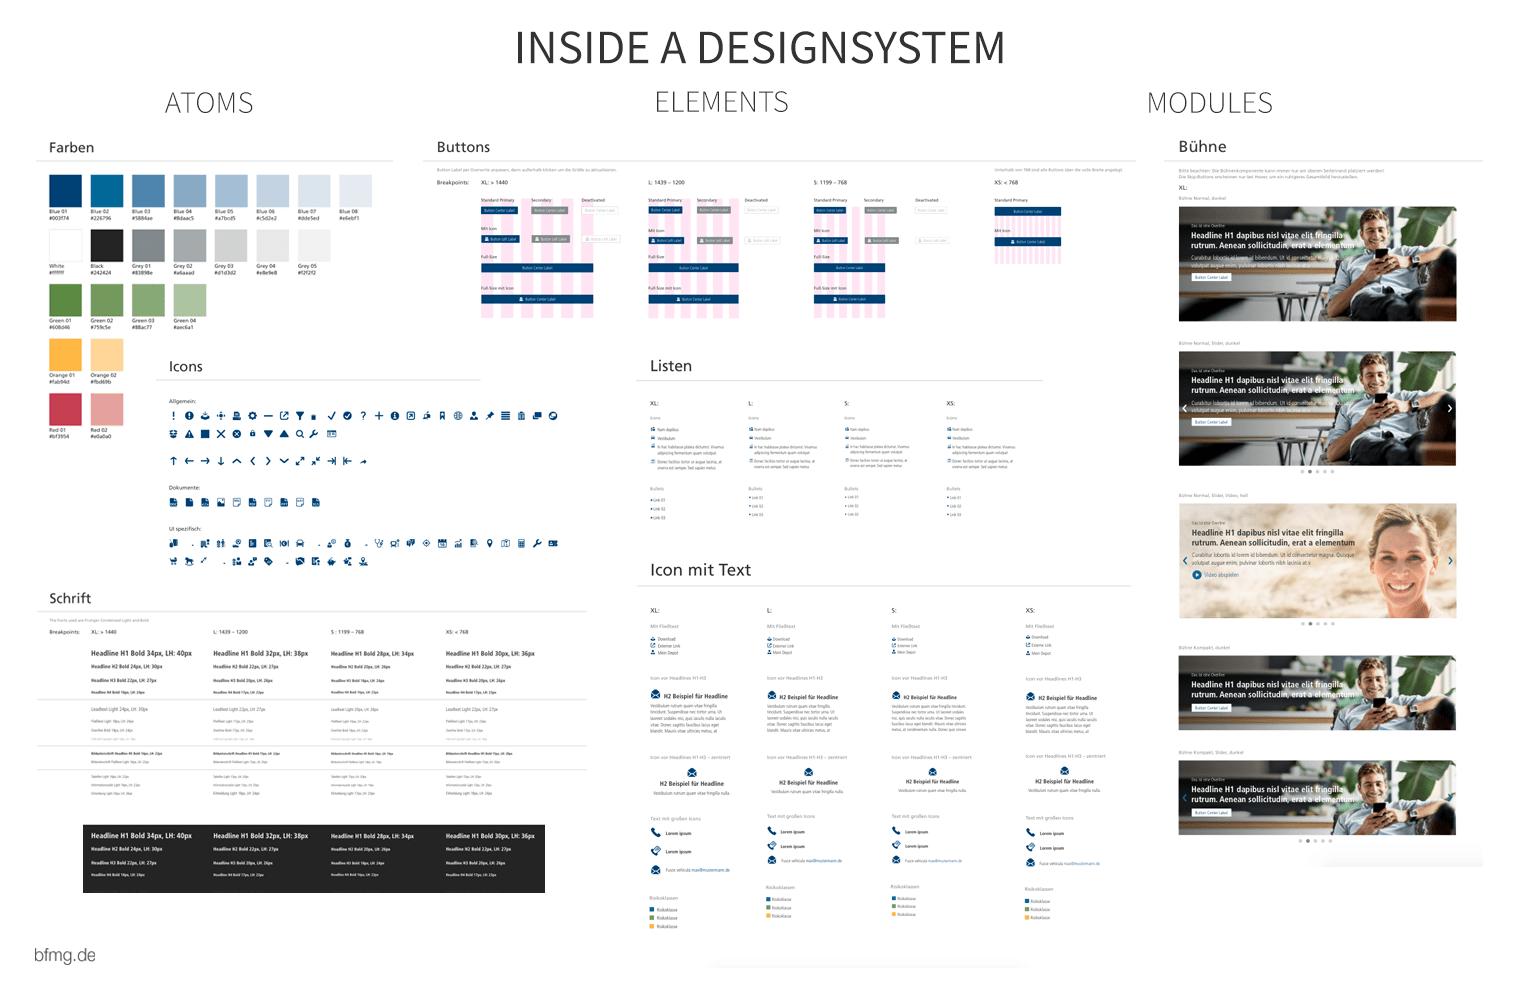 Designsystems